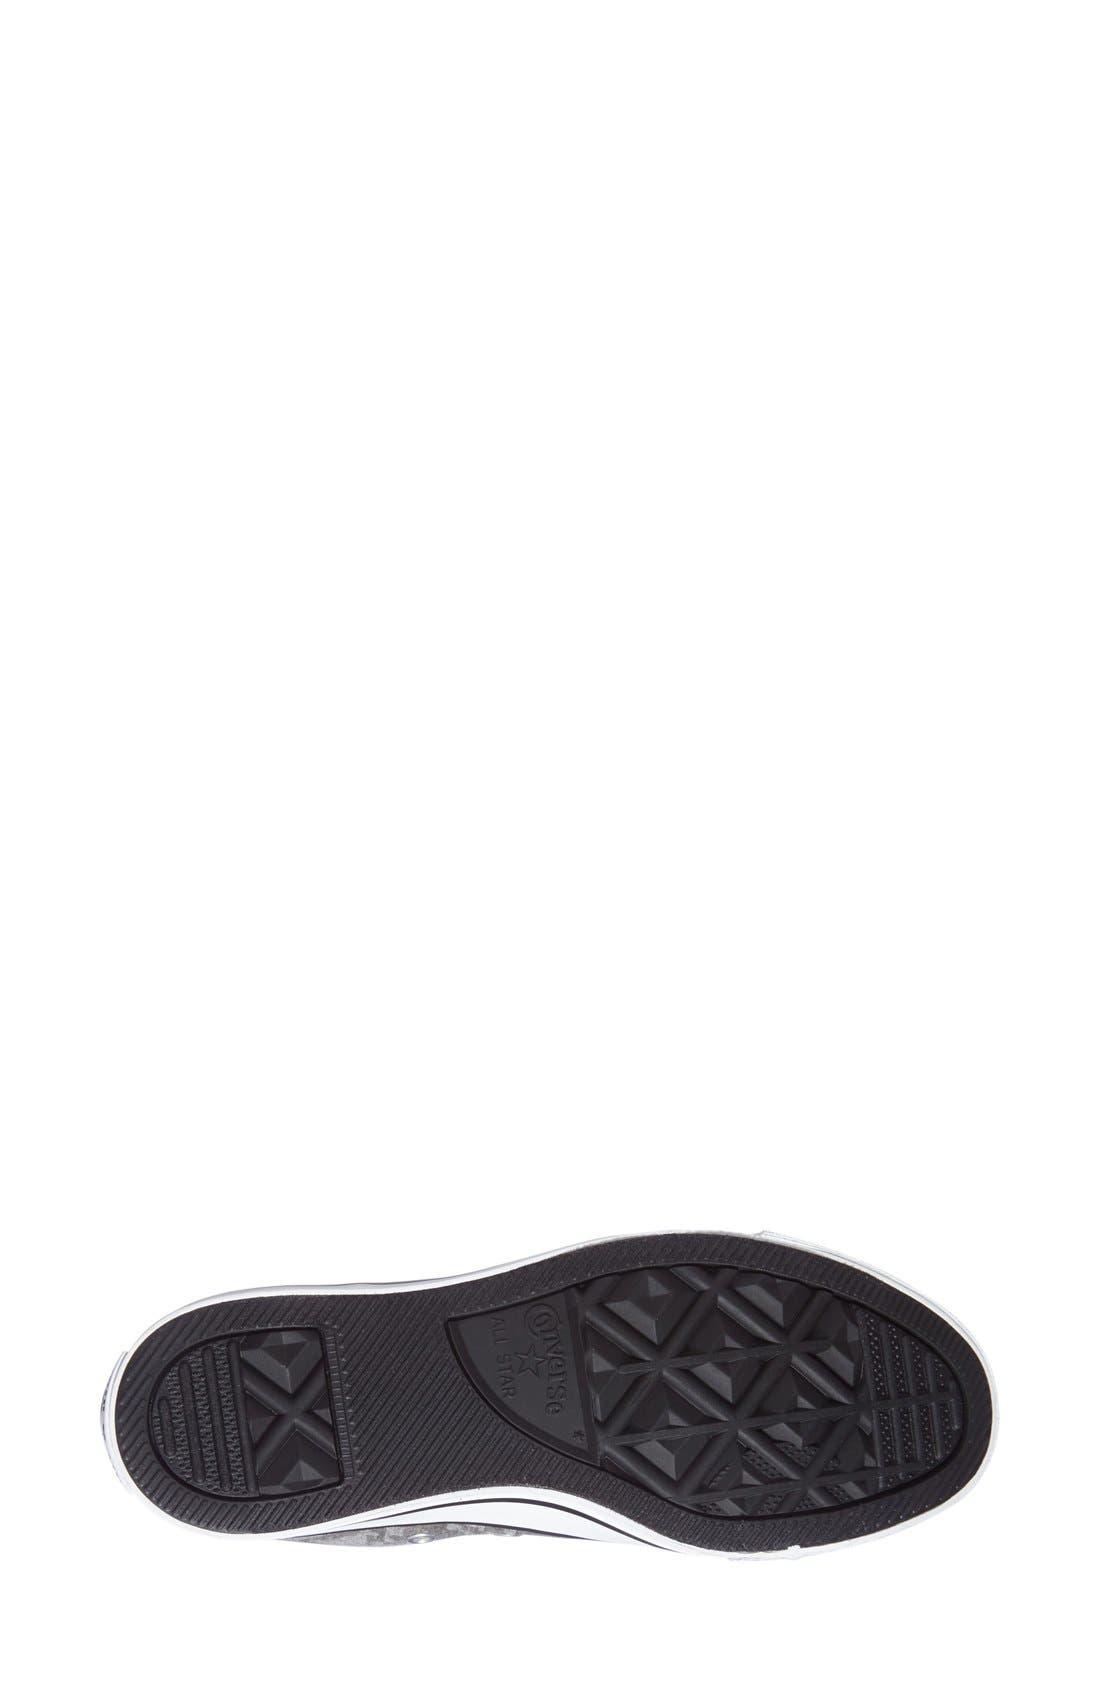 Alternate Image 4  - Converse Chuck Taylor® All Star® Geo Print High Top Sneaker (Women)